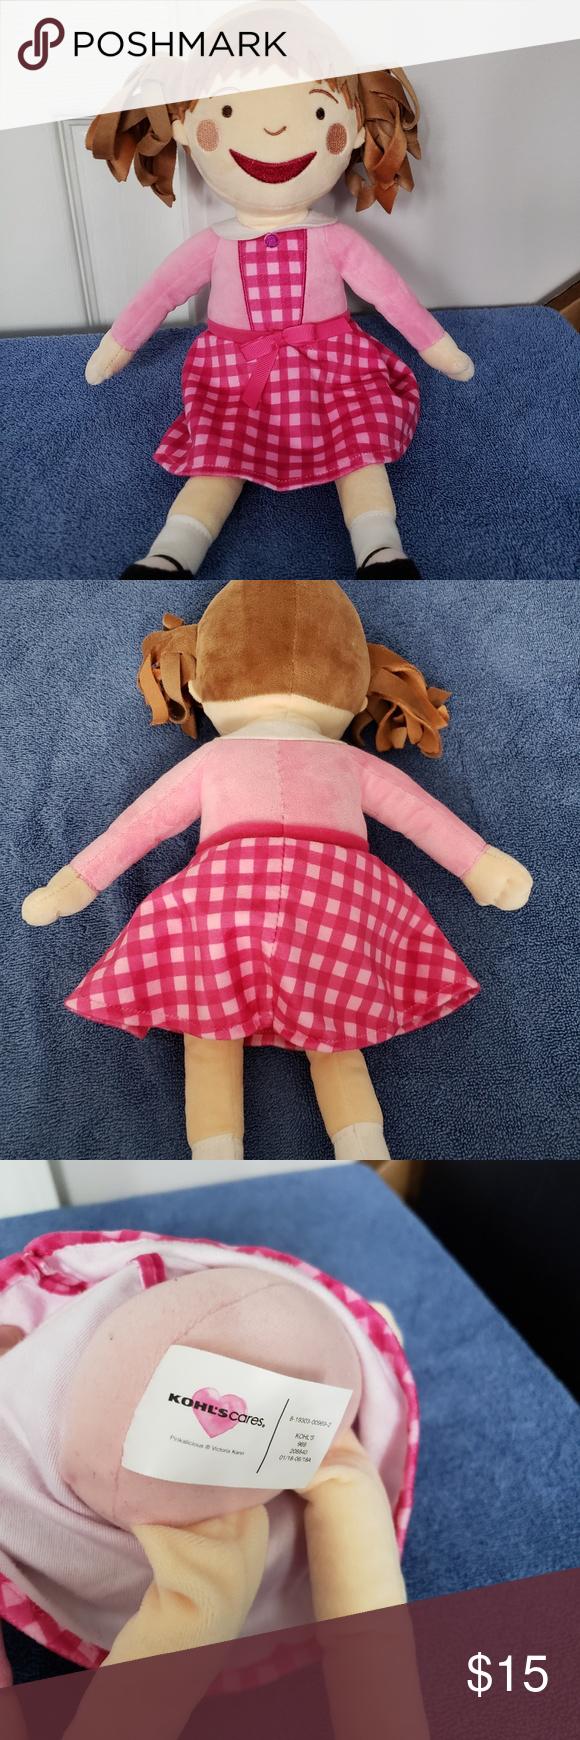 Kohls Cares Pinkalicious Plush Doll Plush Toy 15'' Kohls